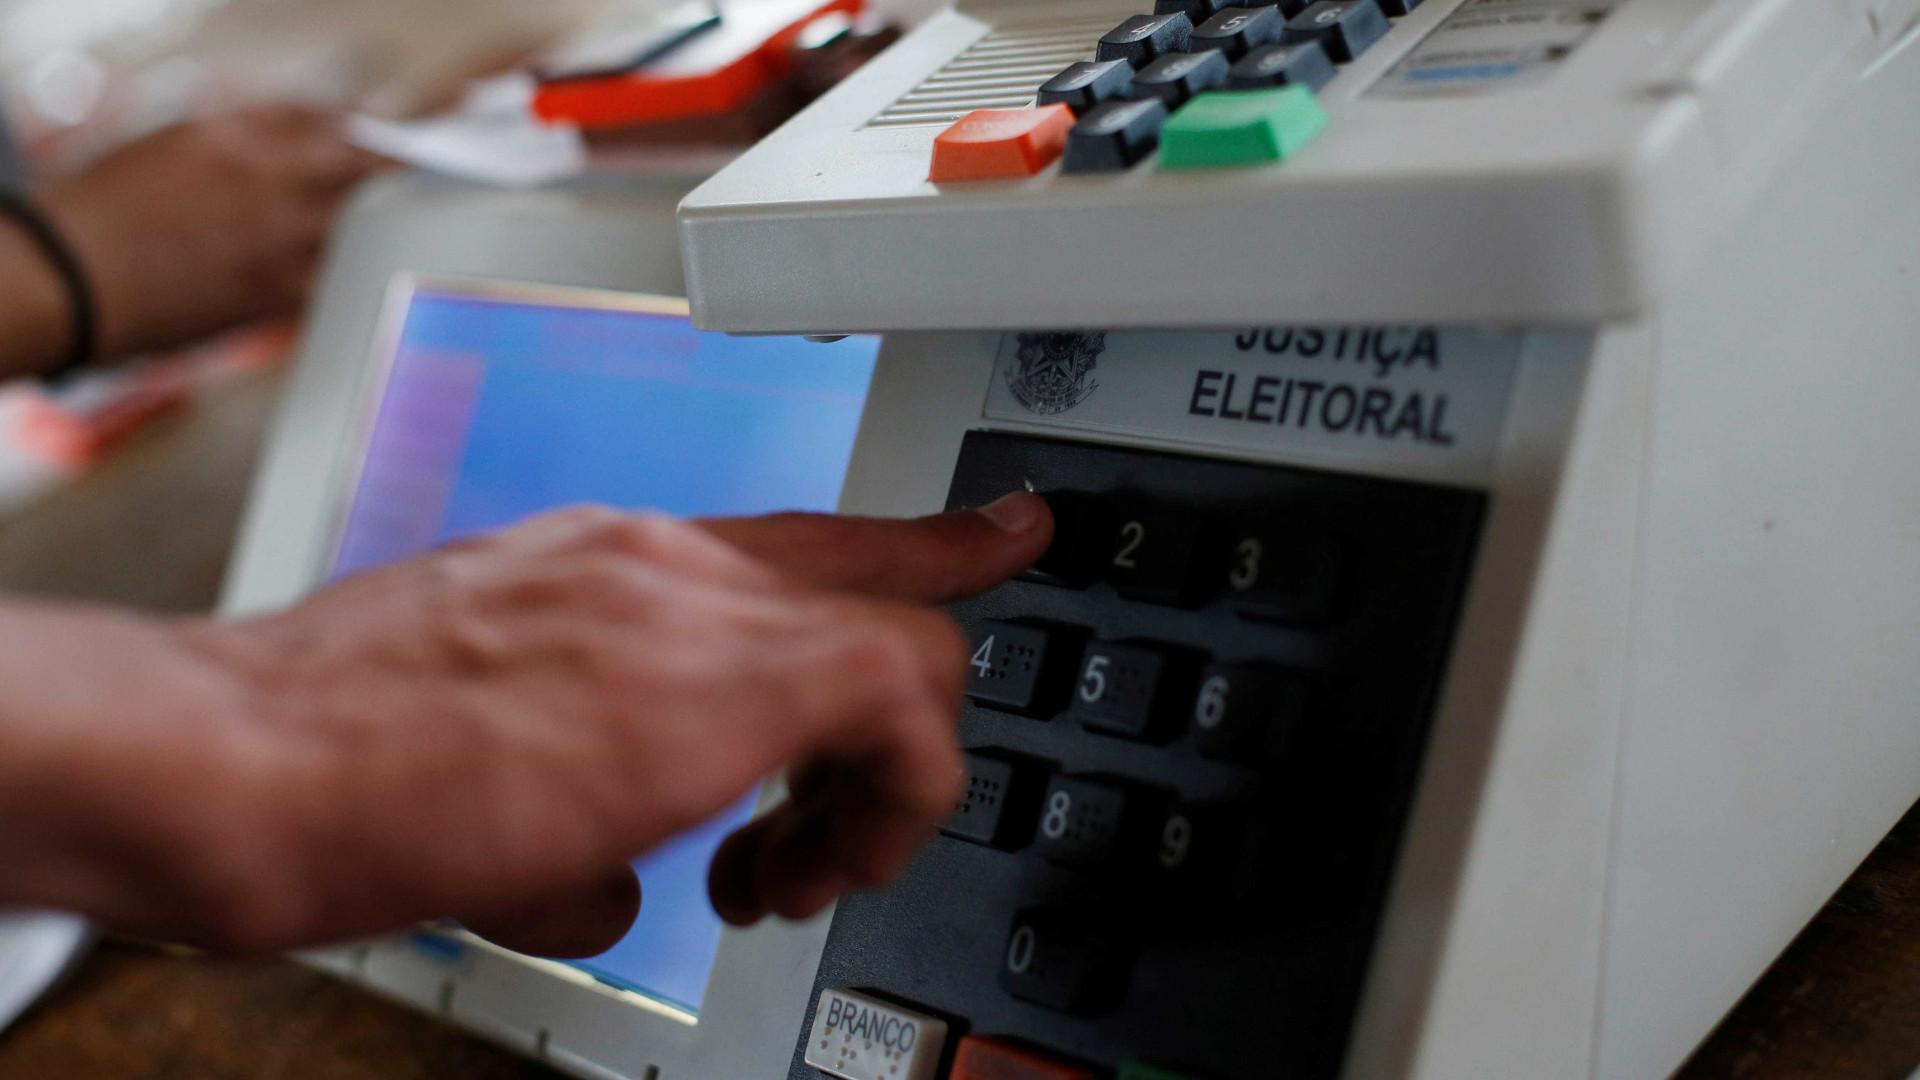 Datafolha: Bolsonaro vai a 28% e Haddad, a 16%; Ciro lidera no 2º turno